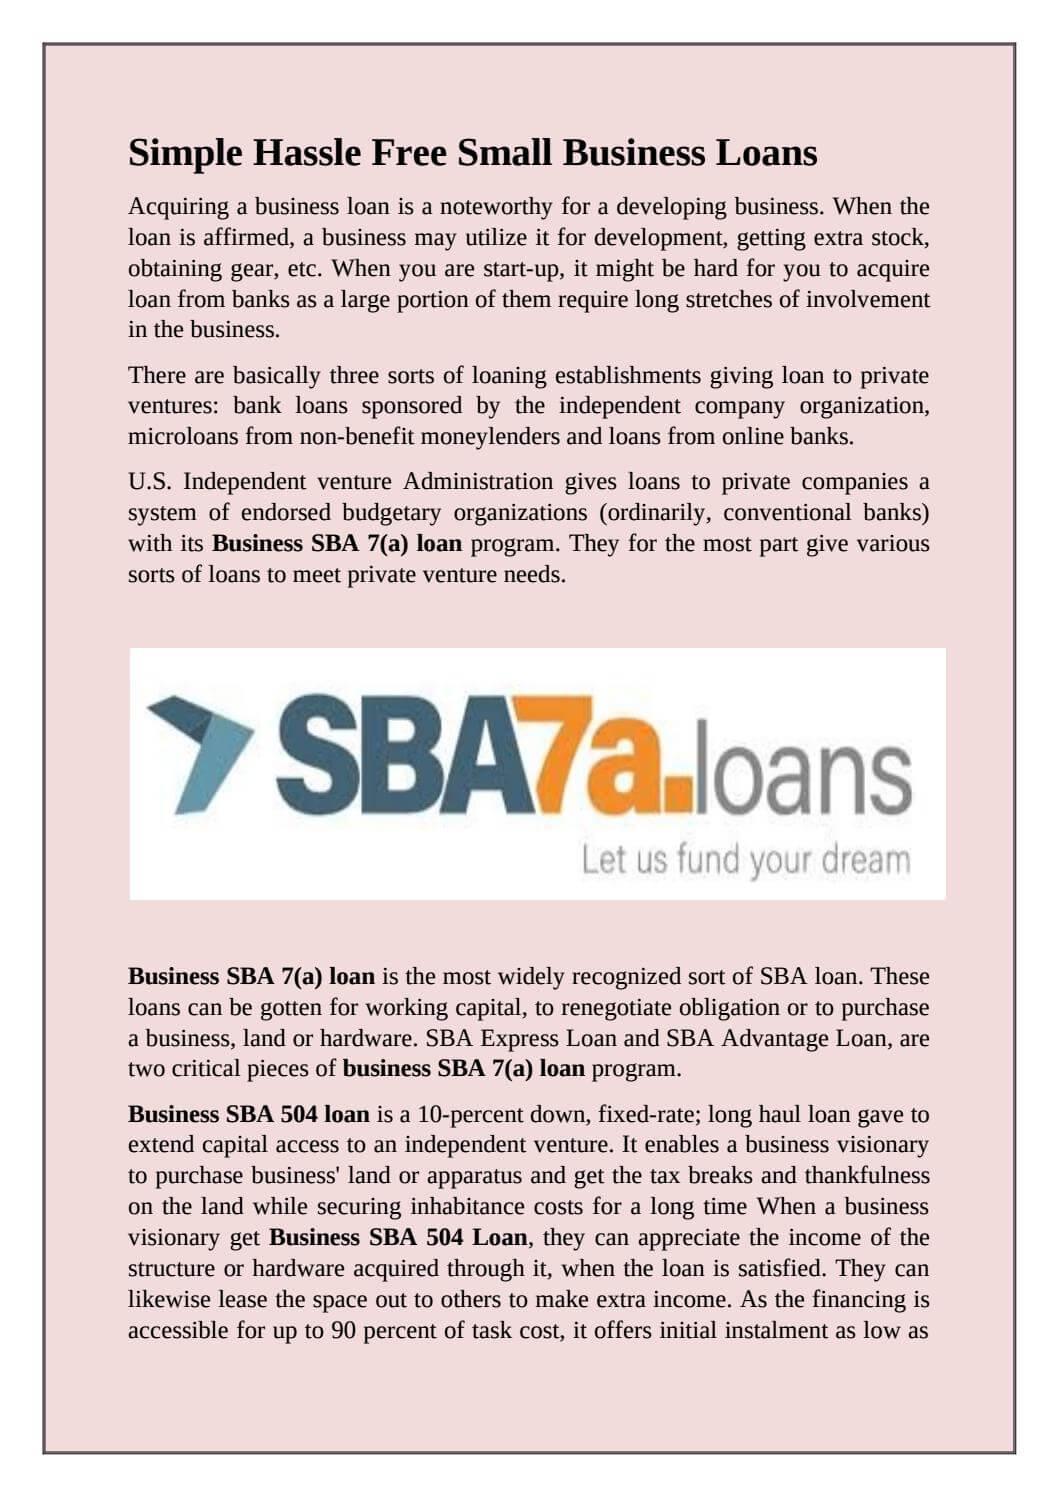 benefits of an SBA Loan